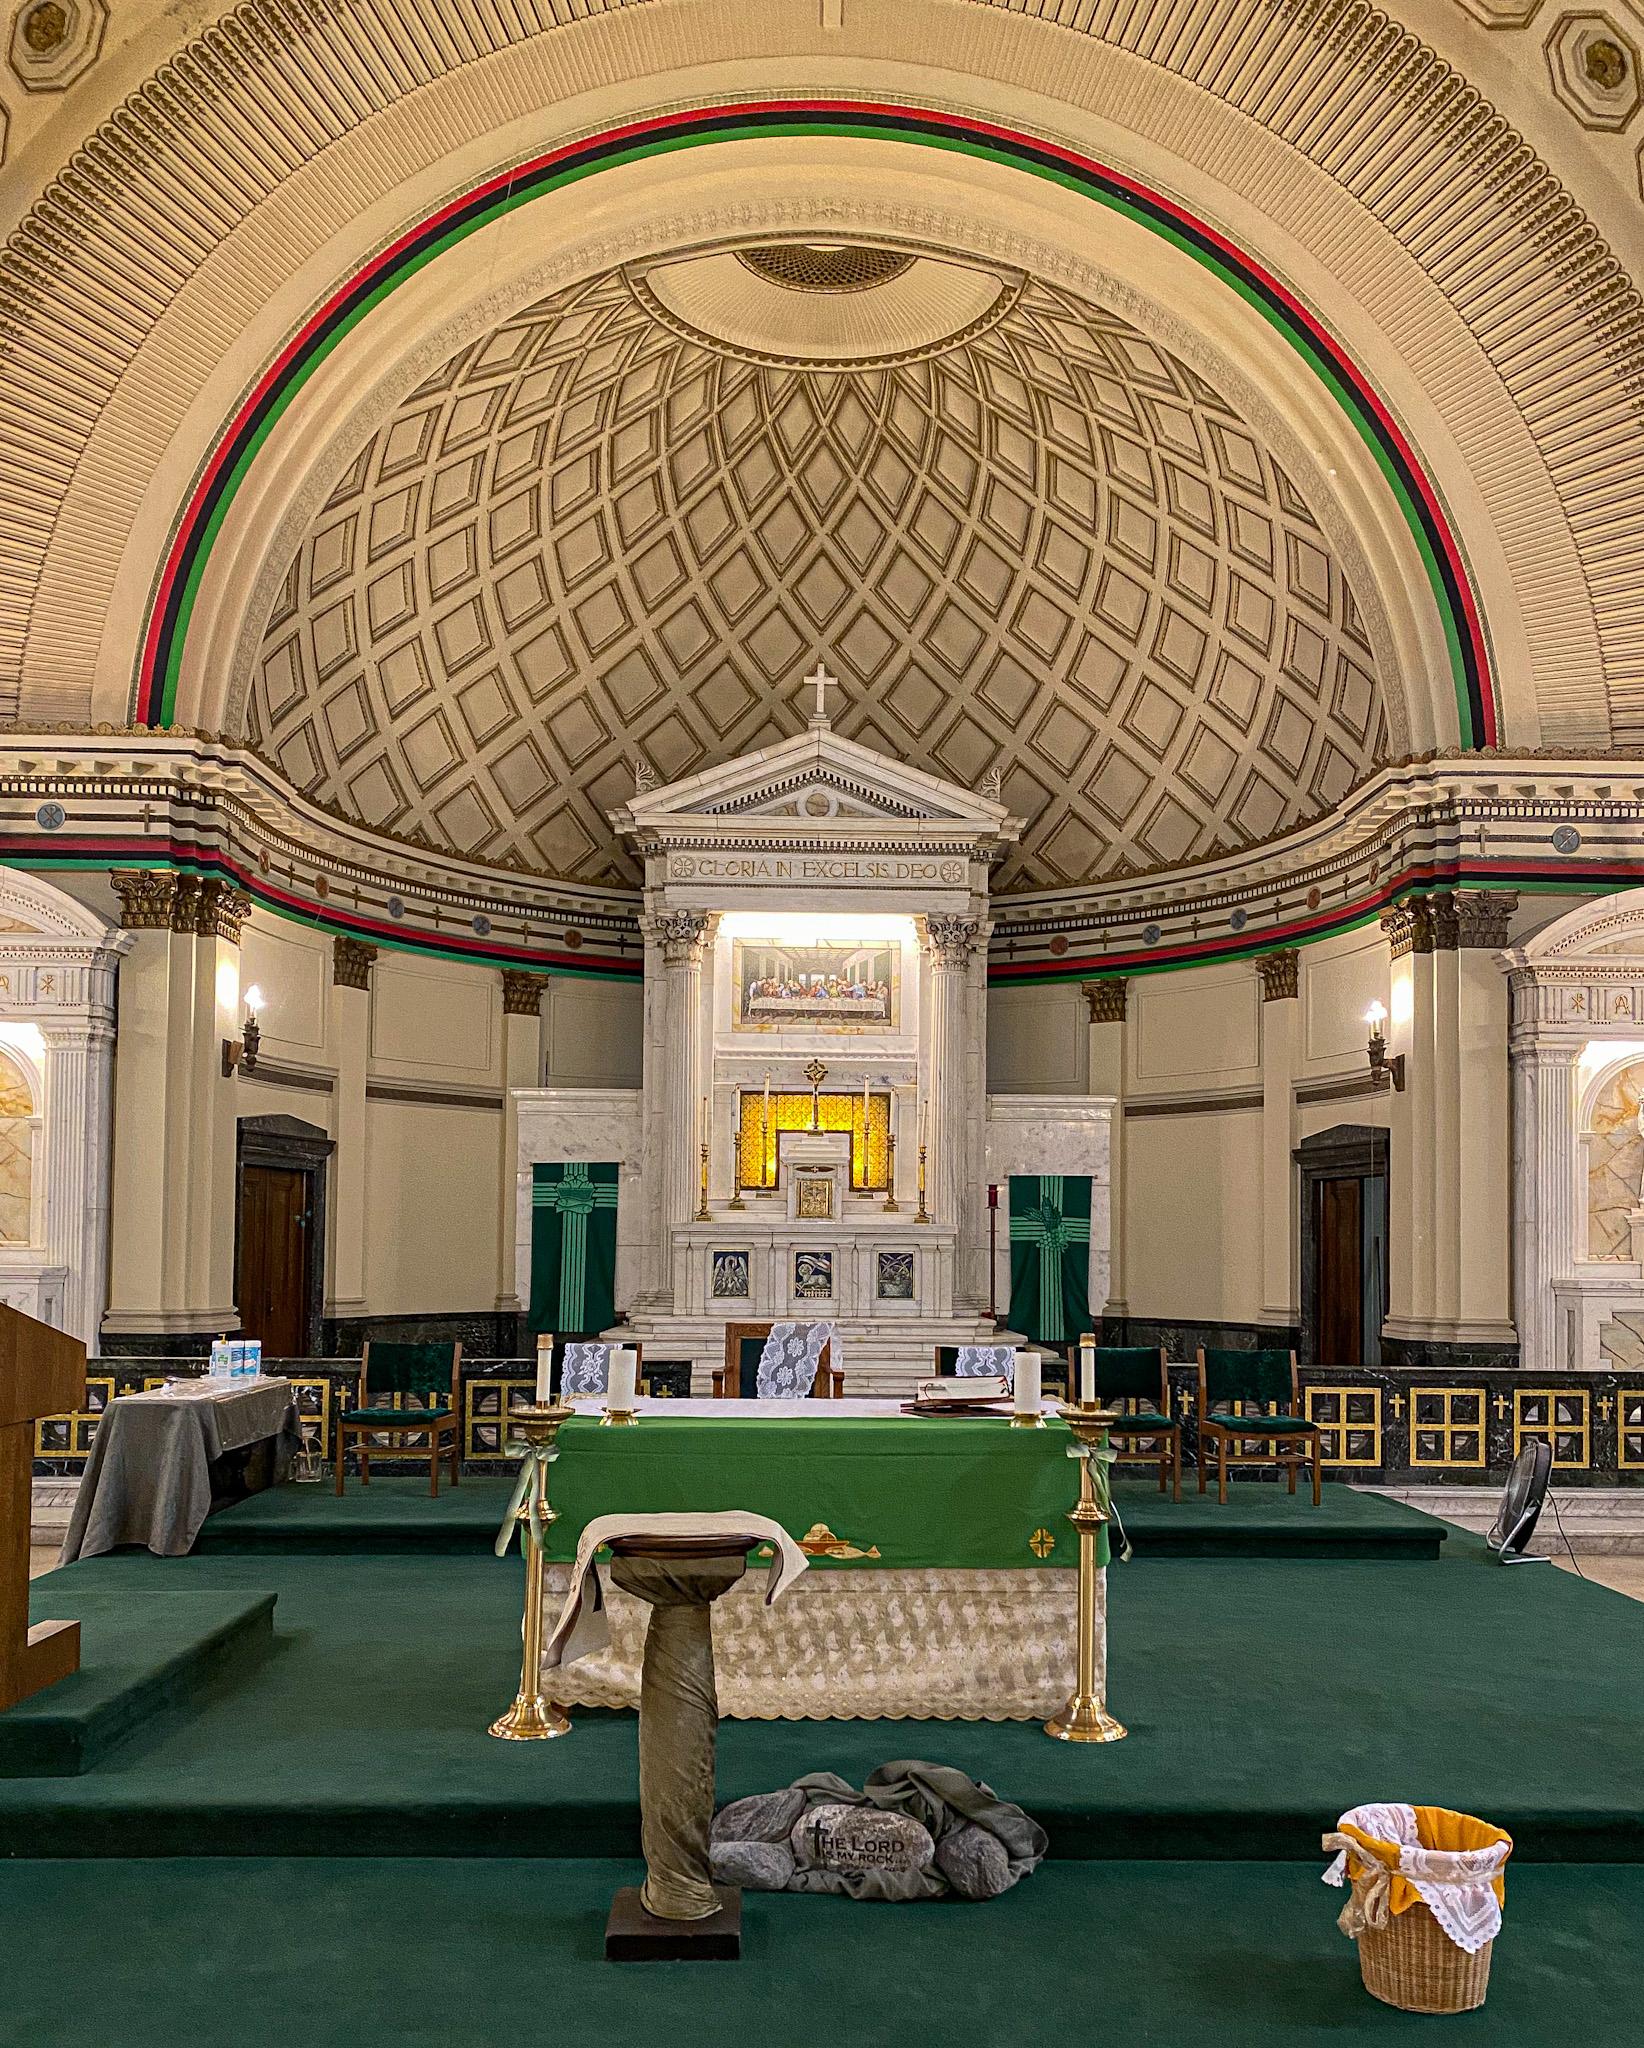 The altar inside Corpus Christi Church, 4920 S. Dr. Martin Luther King Jr. Dr.